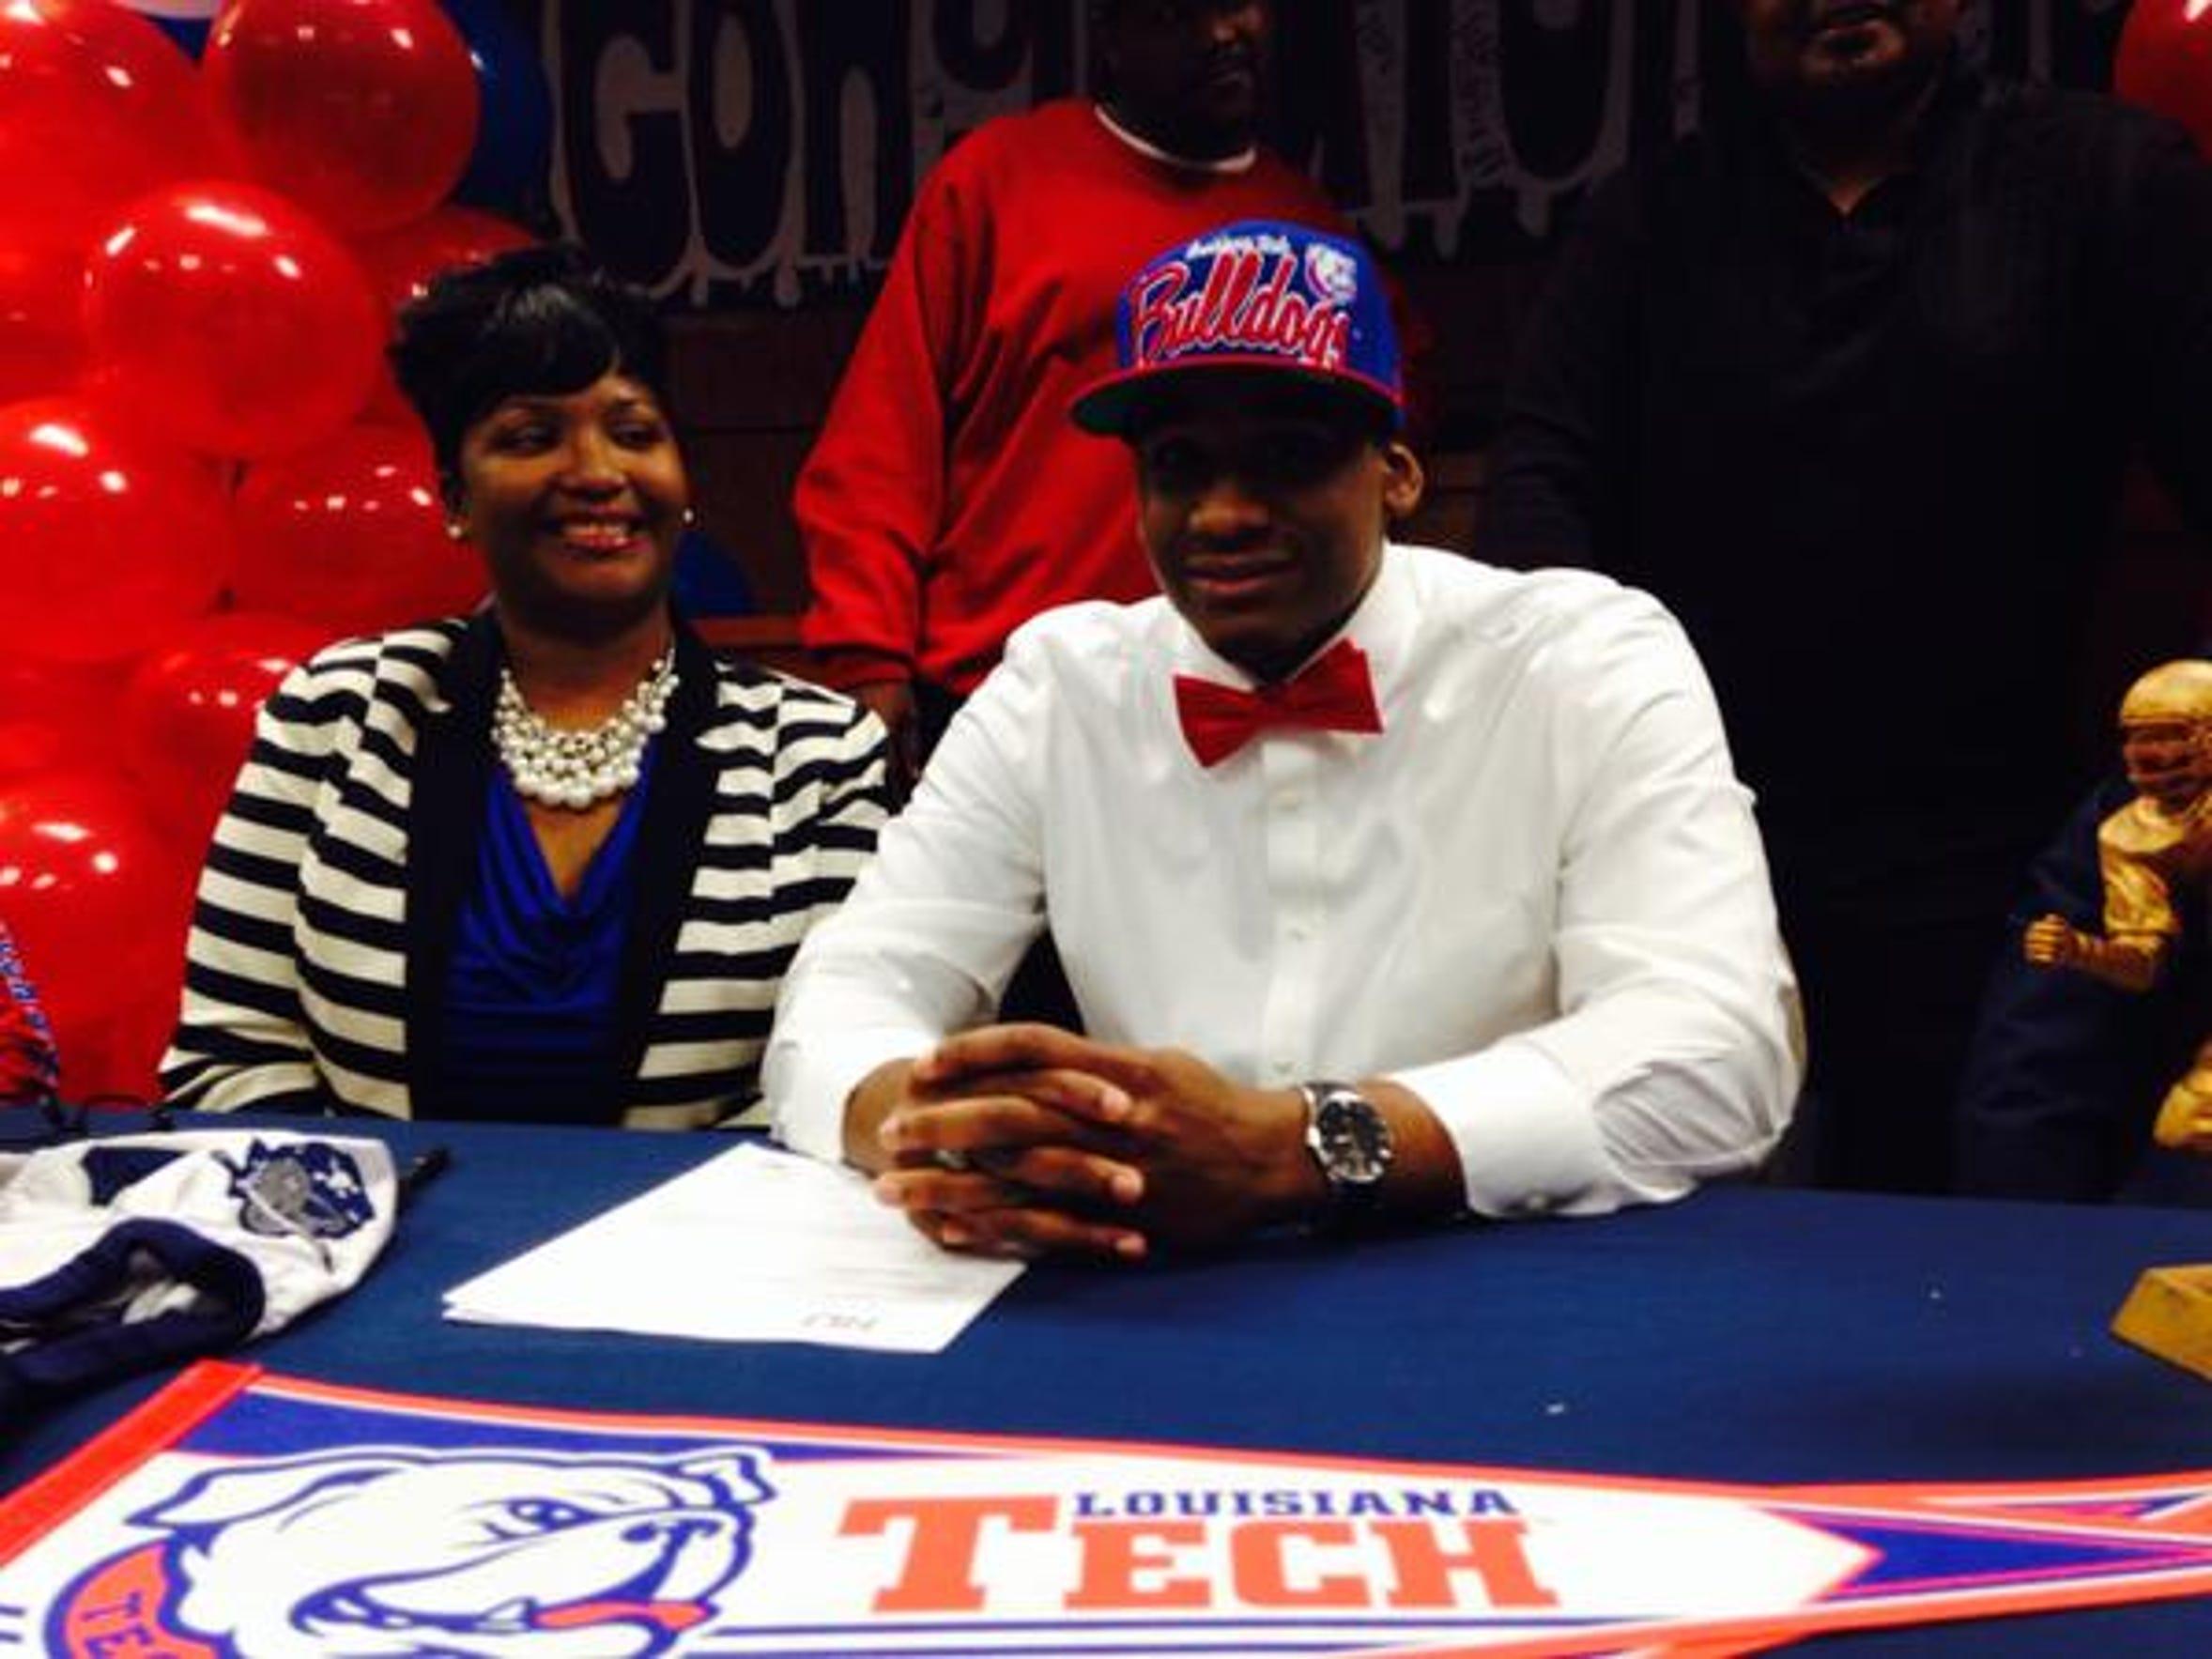 Huntington's Aaron Roberson, right, signed with Louisiana